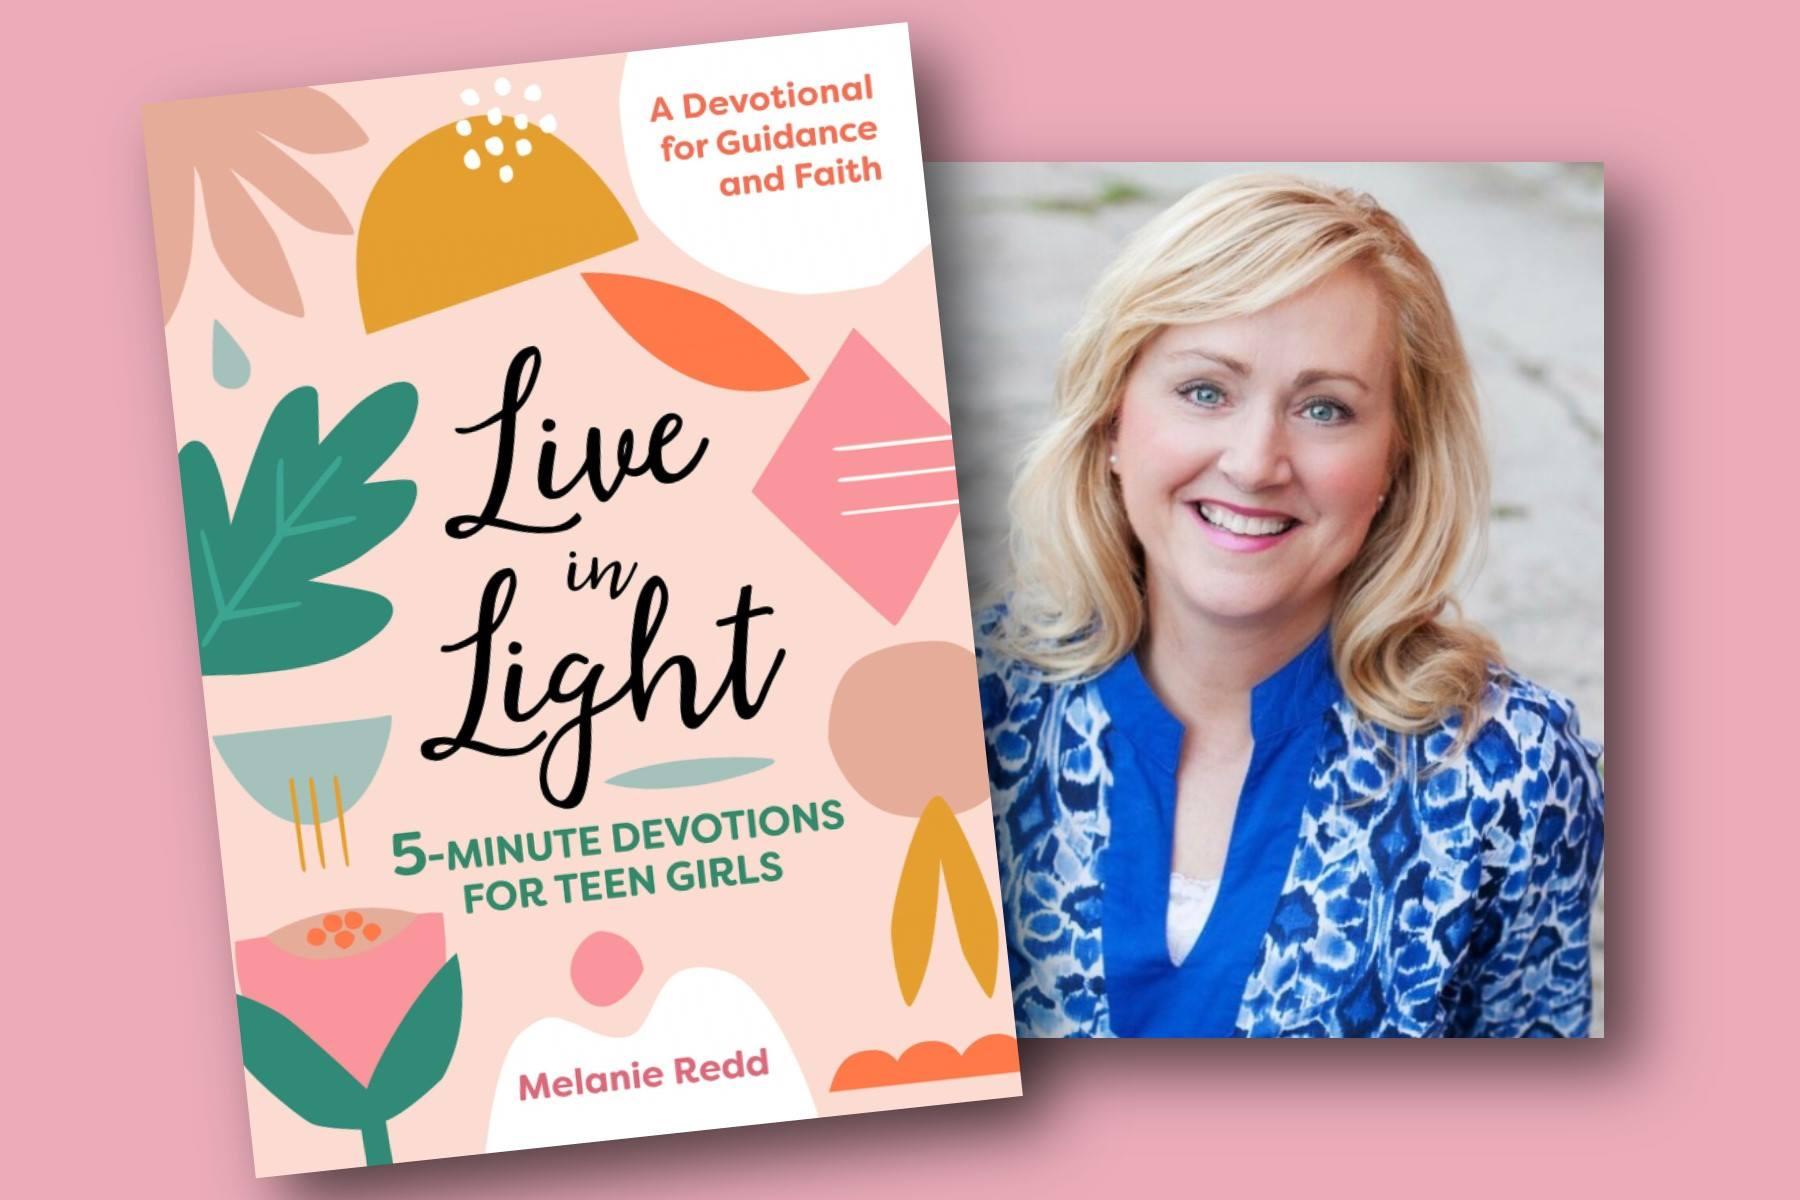 Live the Light 5 minute devotionals for teen girls by Melanie Redd | #teendevotional